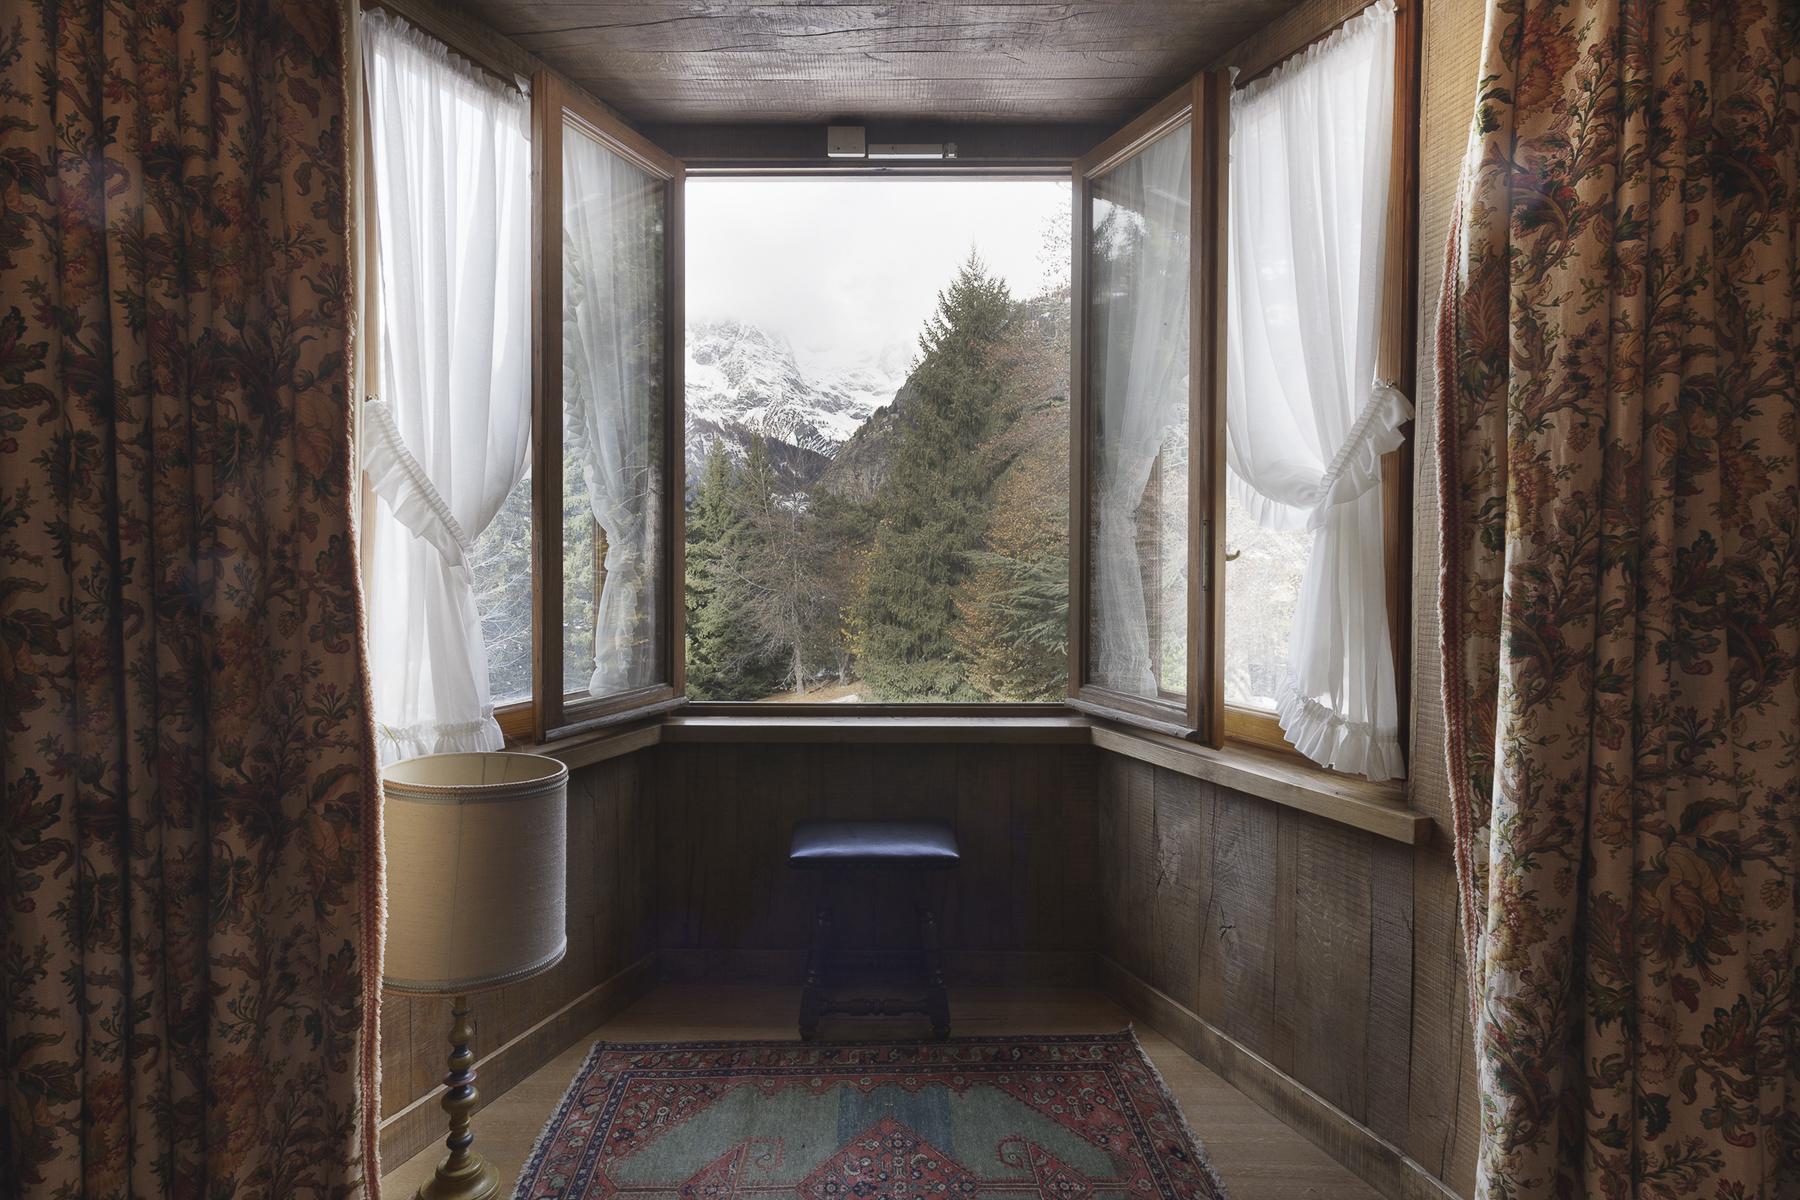 Villa in Vendita a Courmayeur: 5 locali, 900 mq - Foto 9